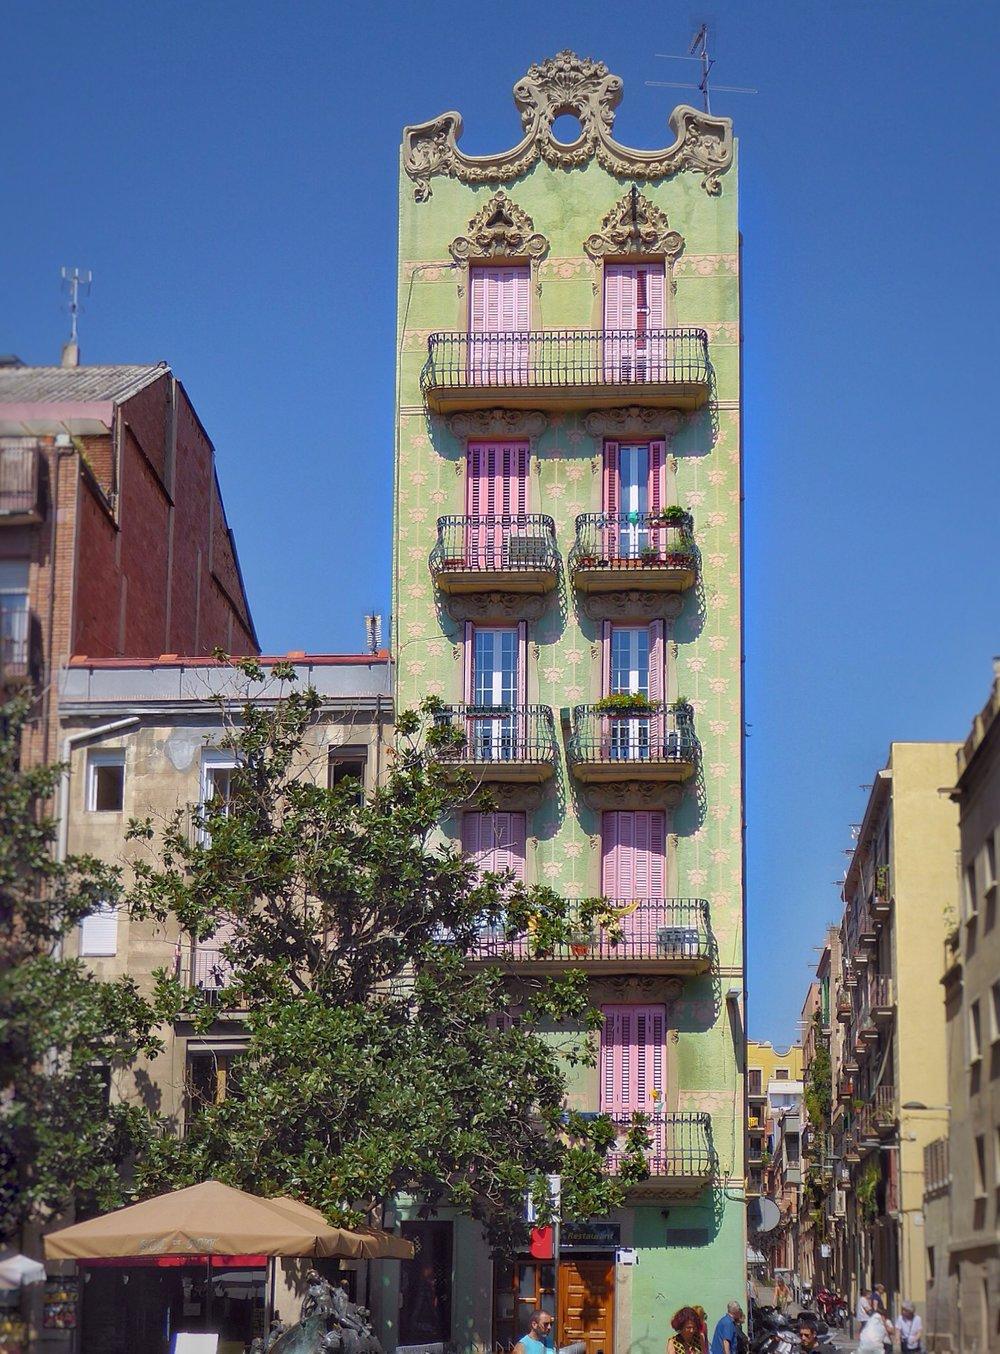 Barcelona, Gracia